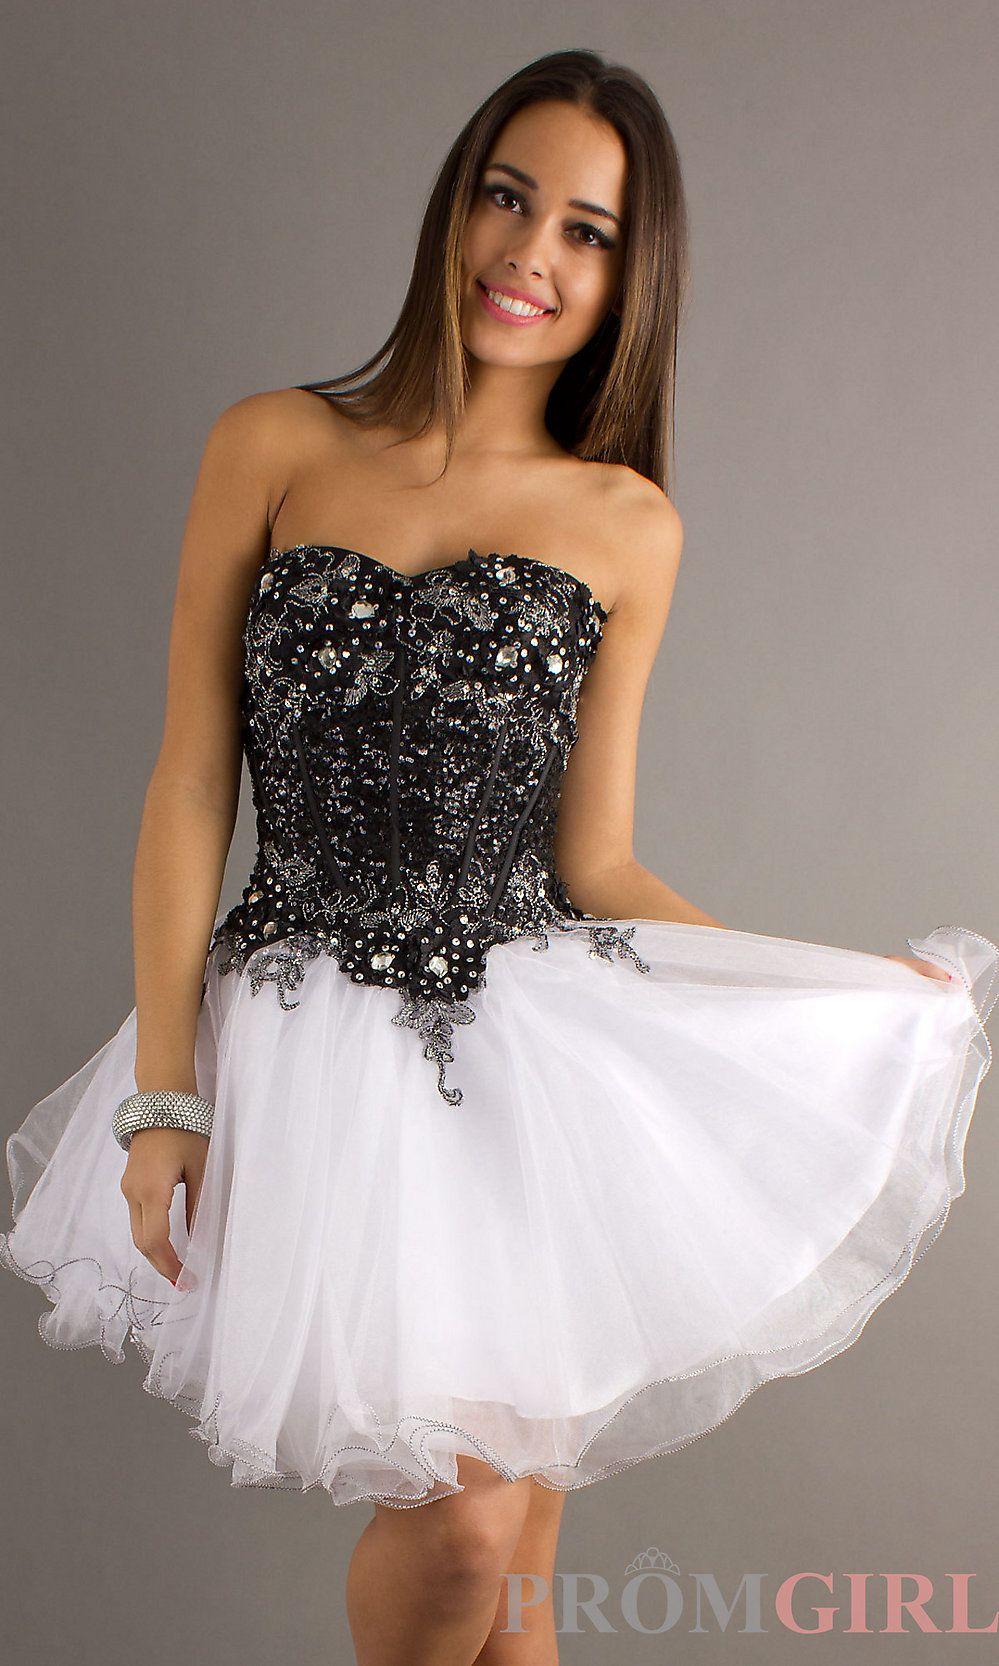 all white graduation dresses - Dress Yp